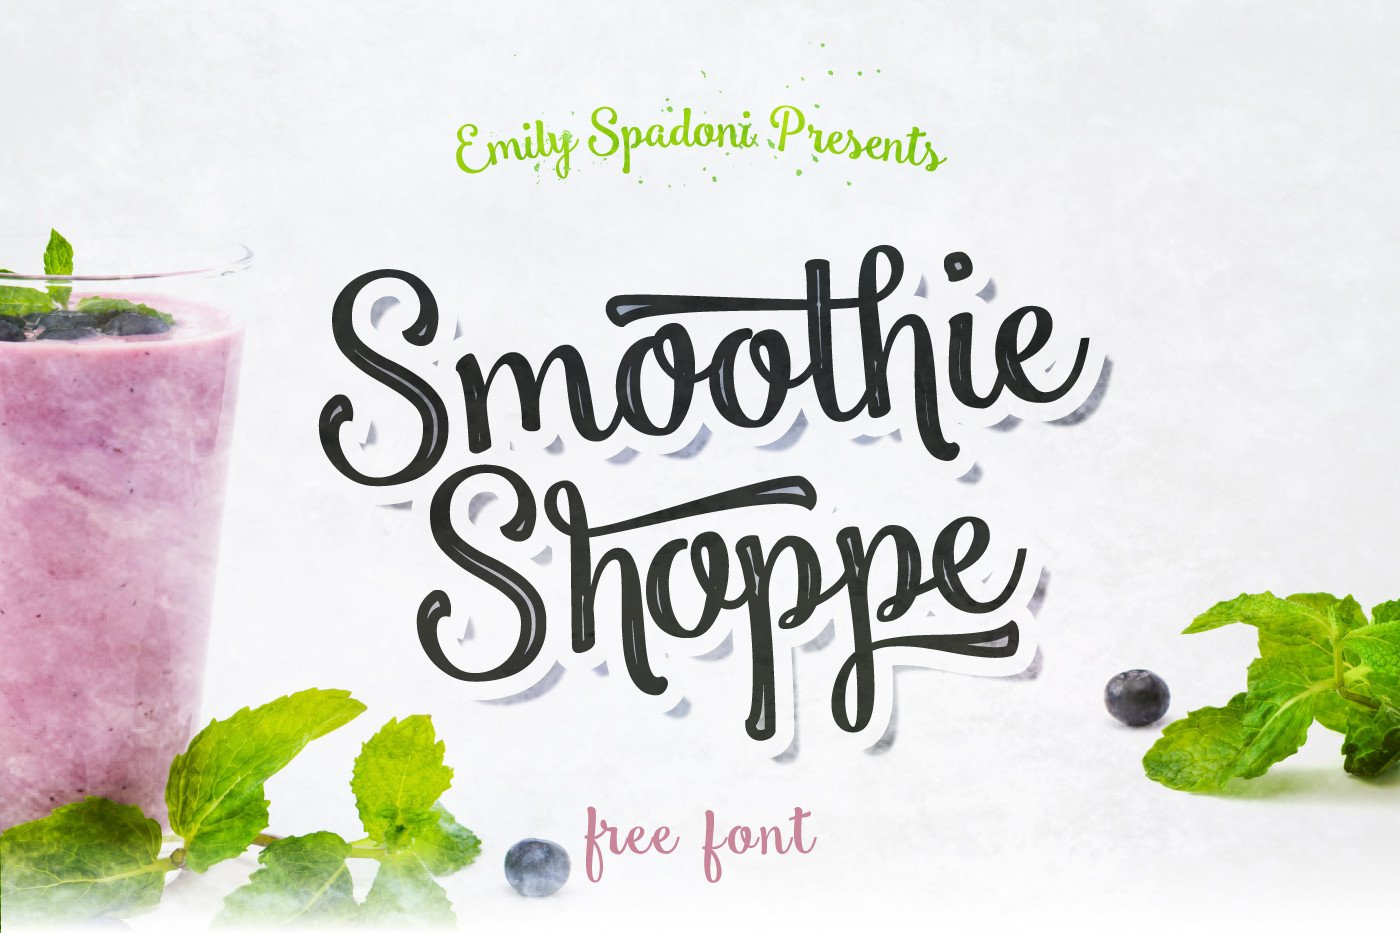 Smoothie-Shoppe-Free-Script-Font-Preview-01